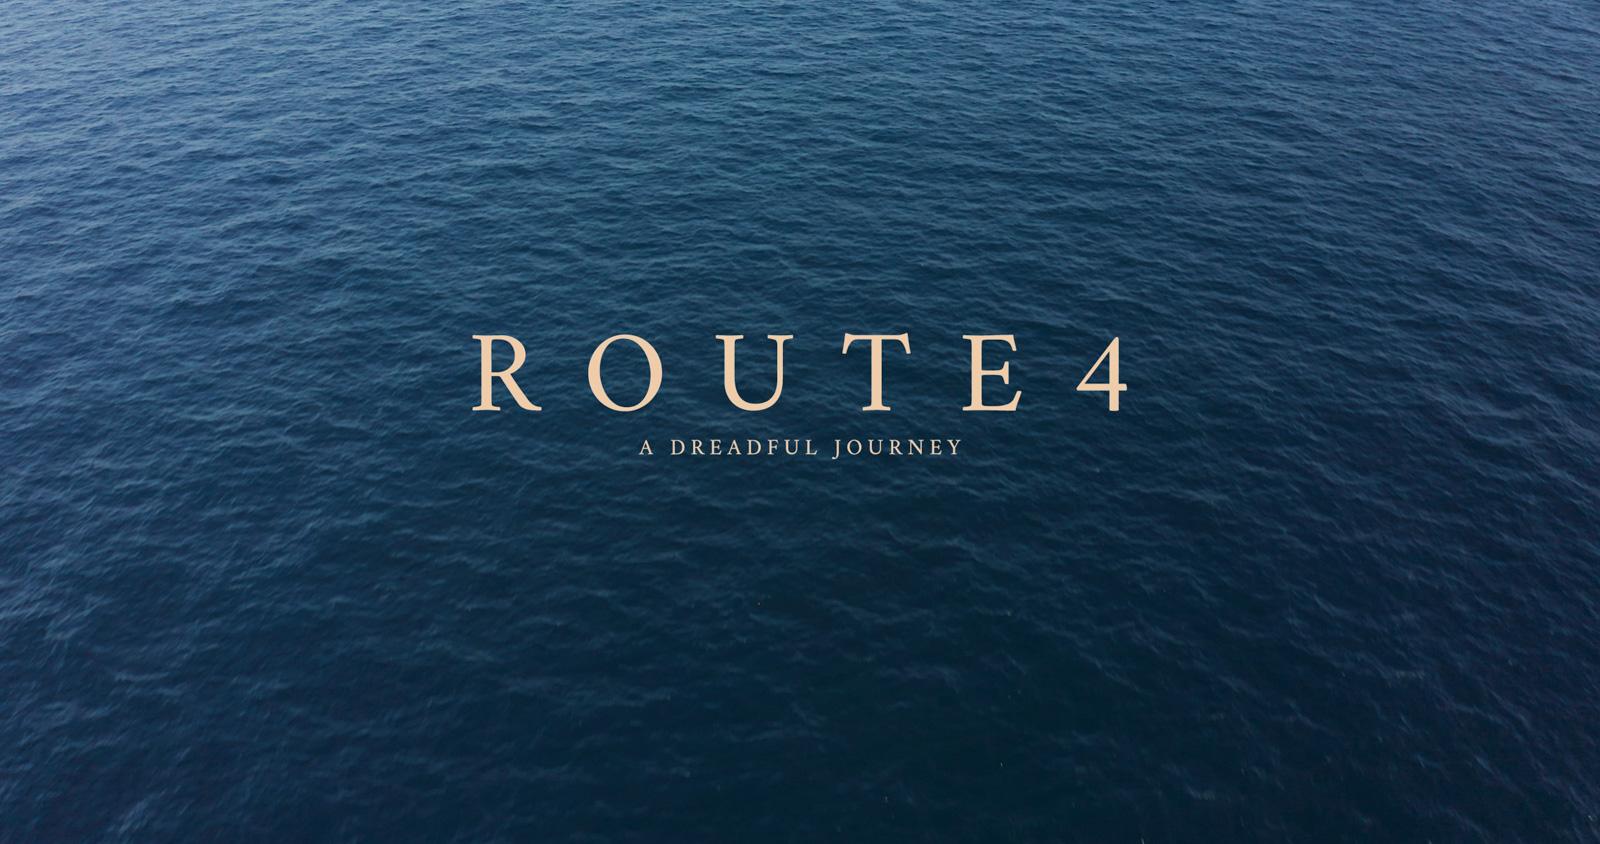 Route 4 - A Dreadful Journey